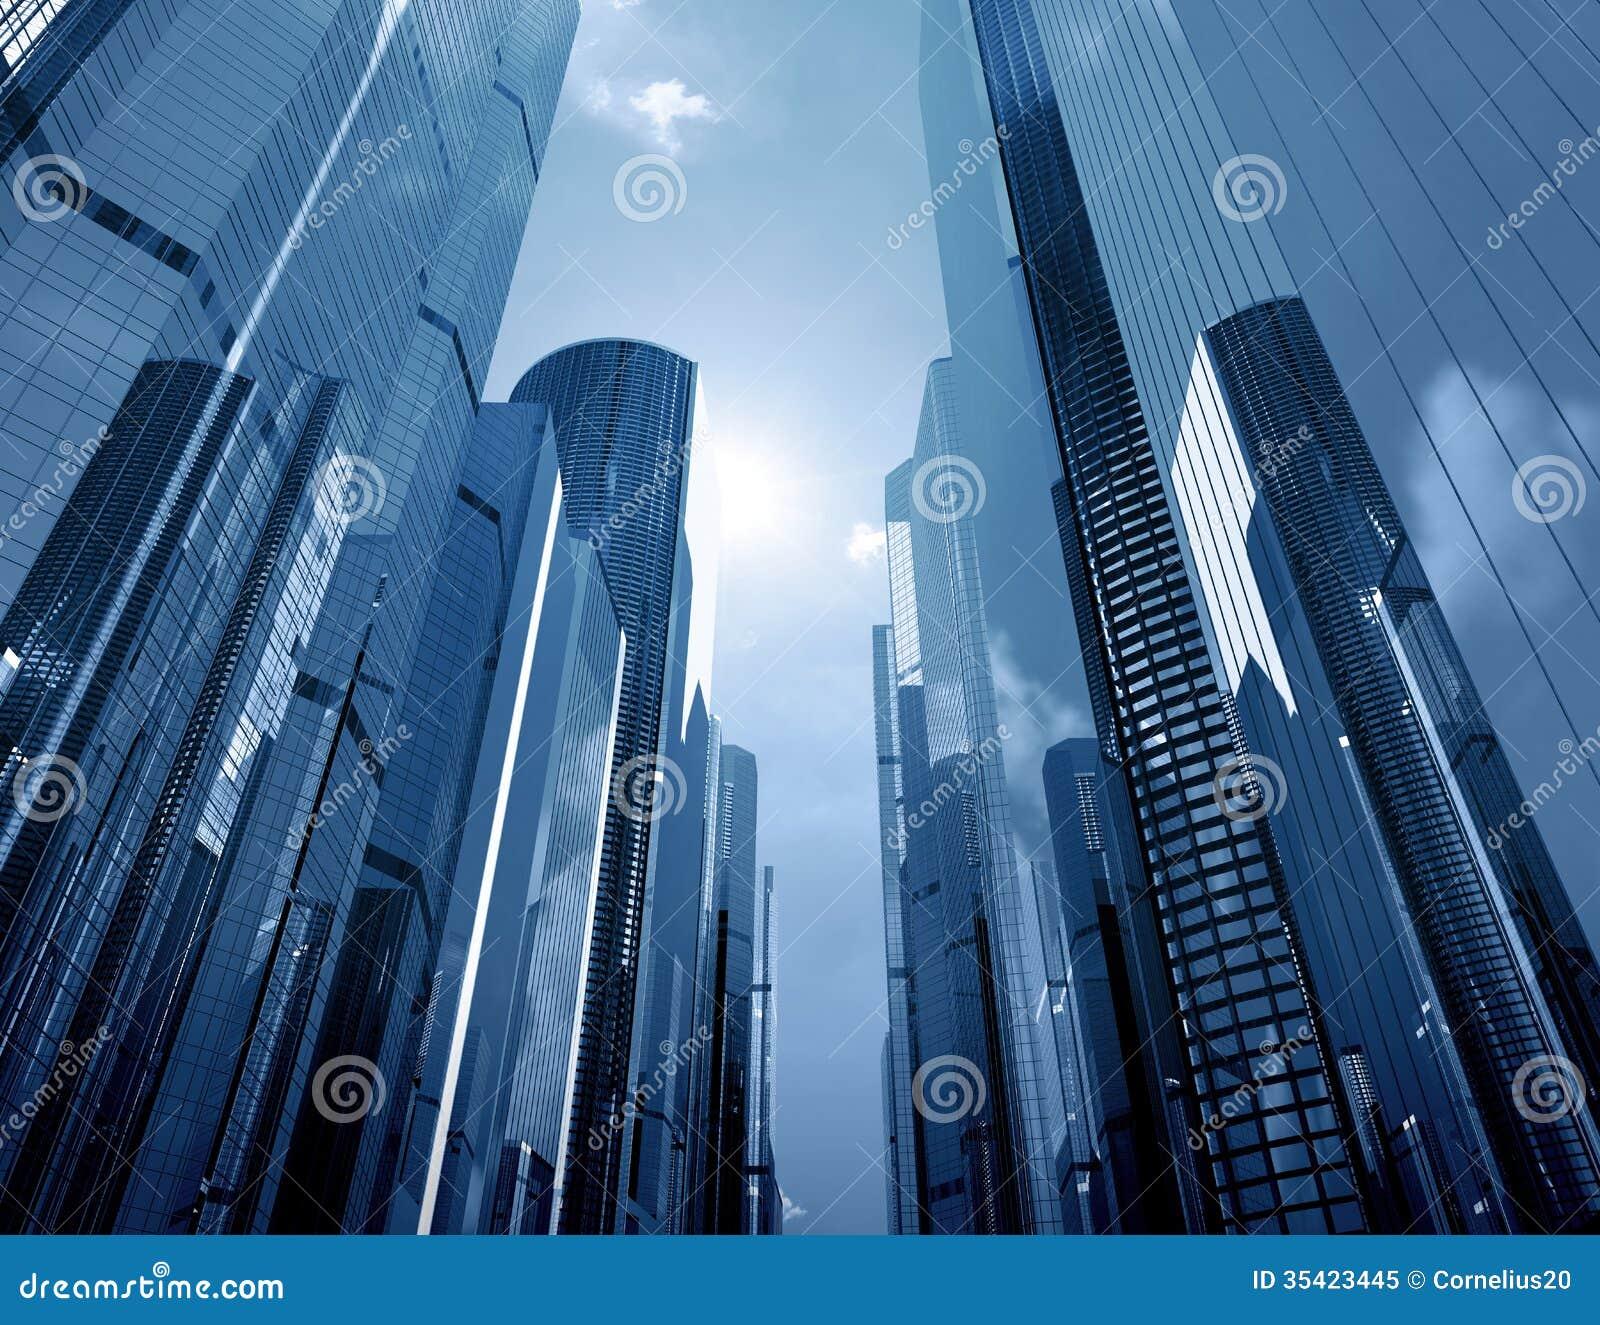 city of glass epub download free